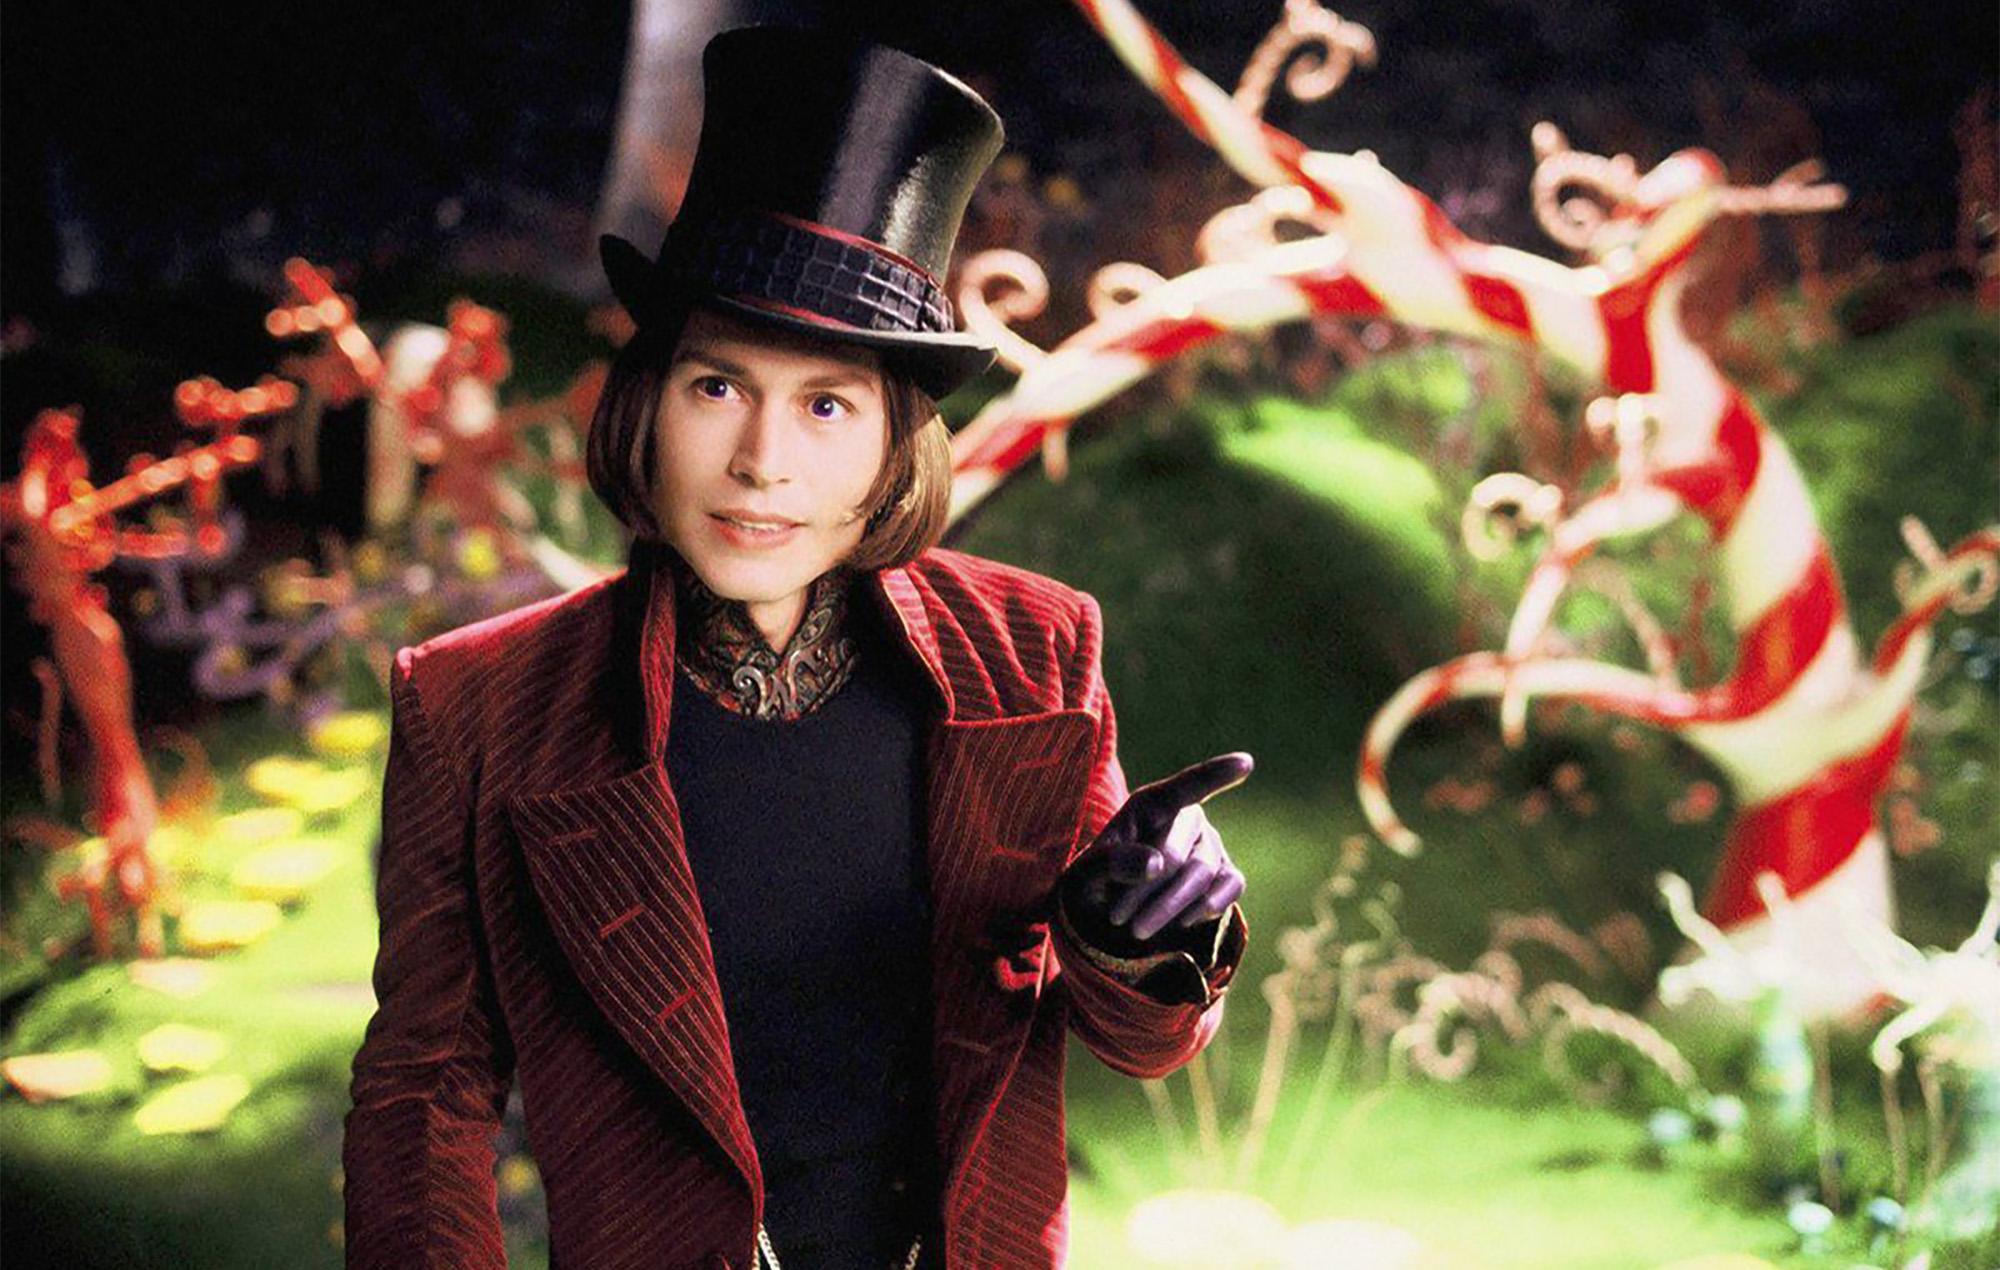 Willy Wonka Johnny Depp